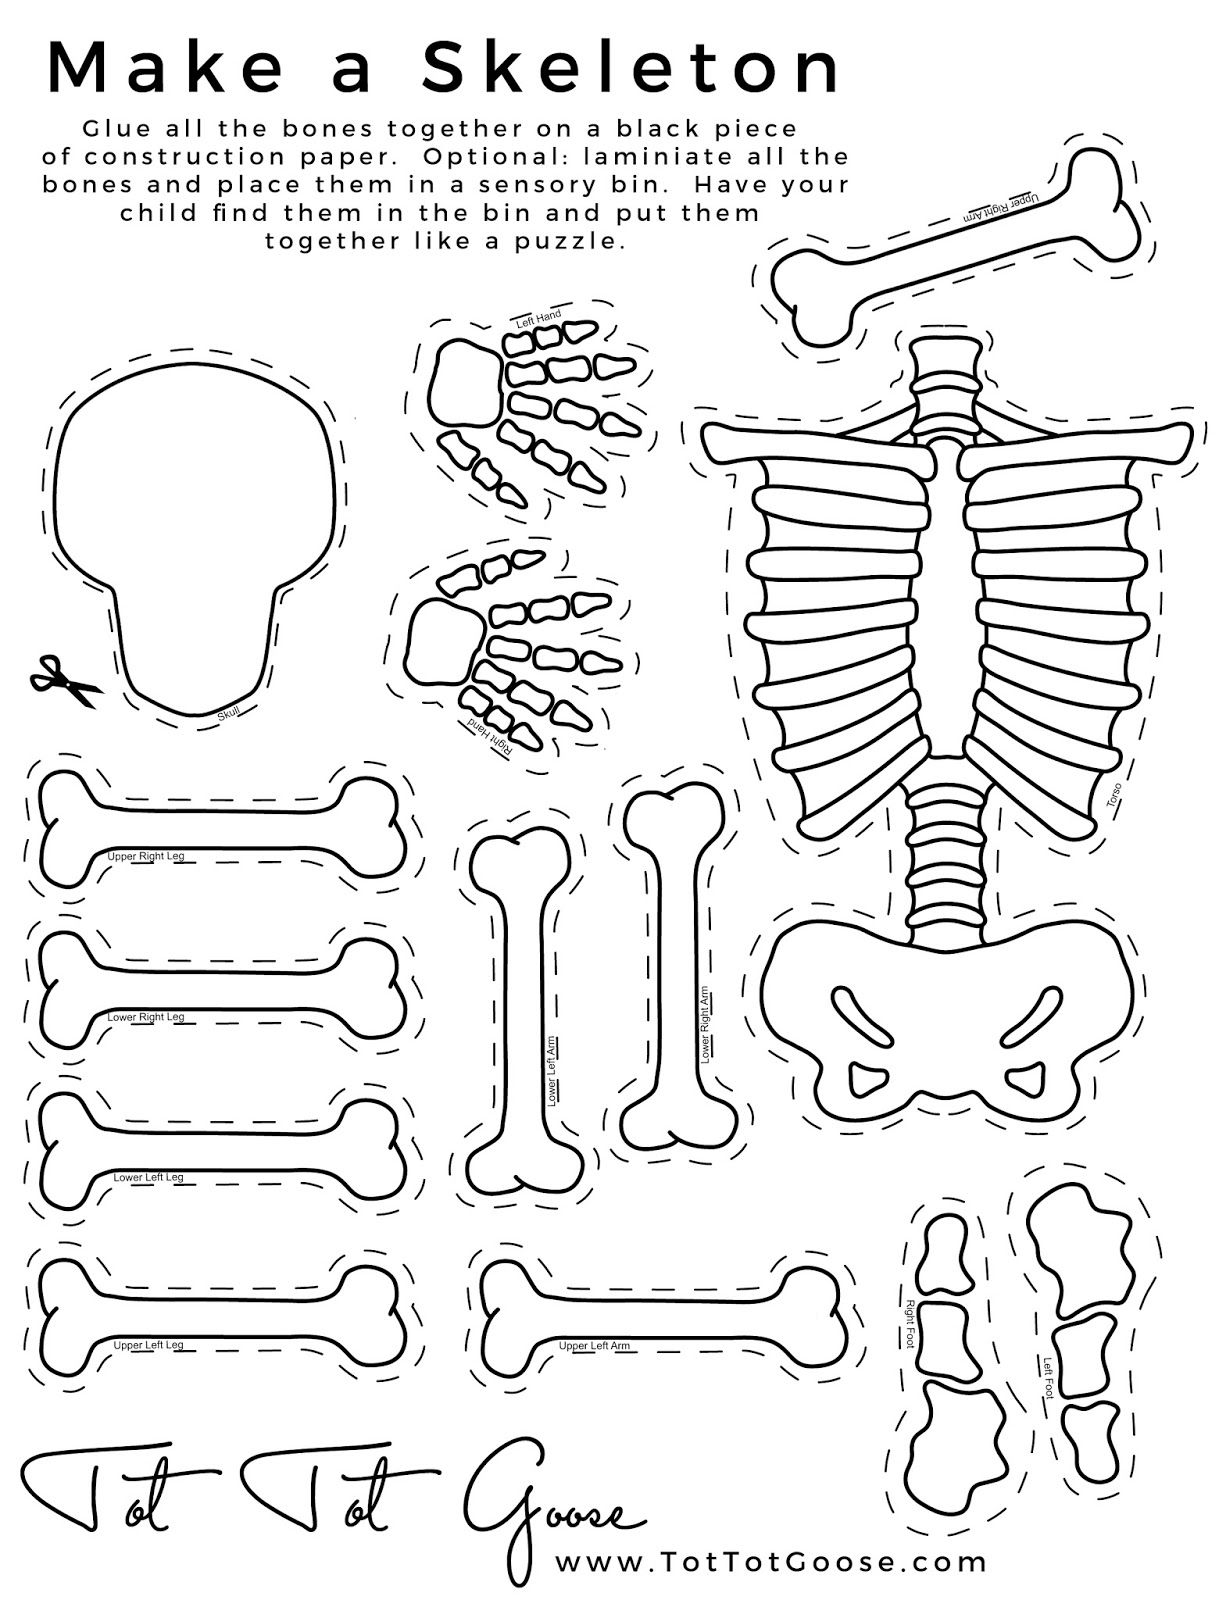 skeleton printable all about me theme preschool theme all about my body preschool homeschool curriculum tot school more [ 1219 x 1600 Pixel ]